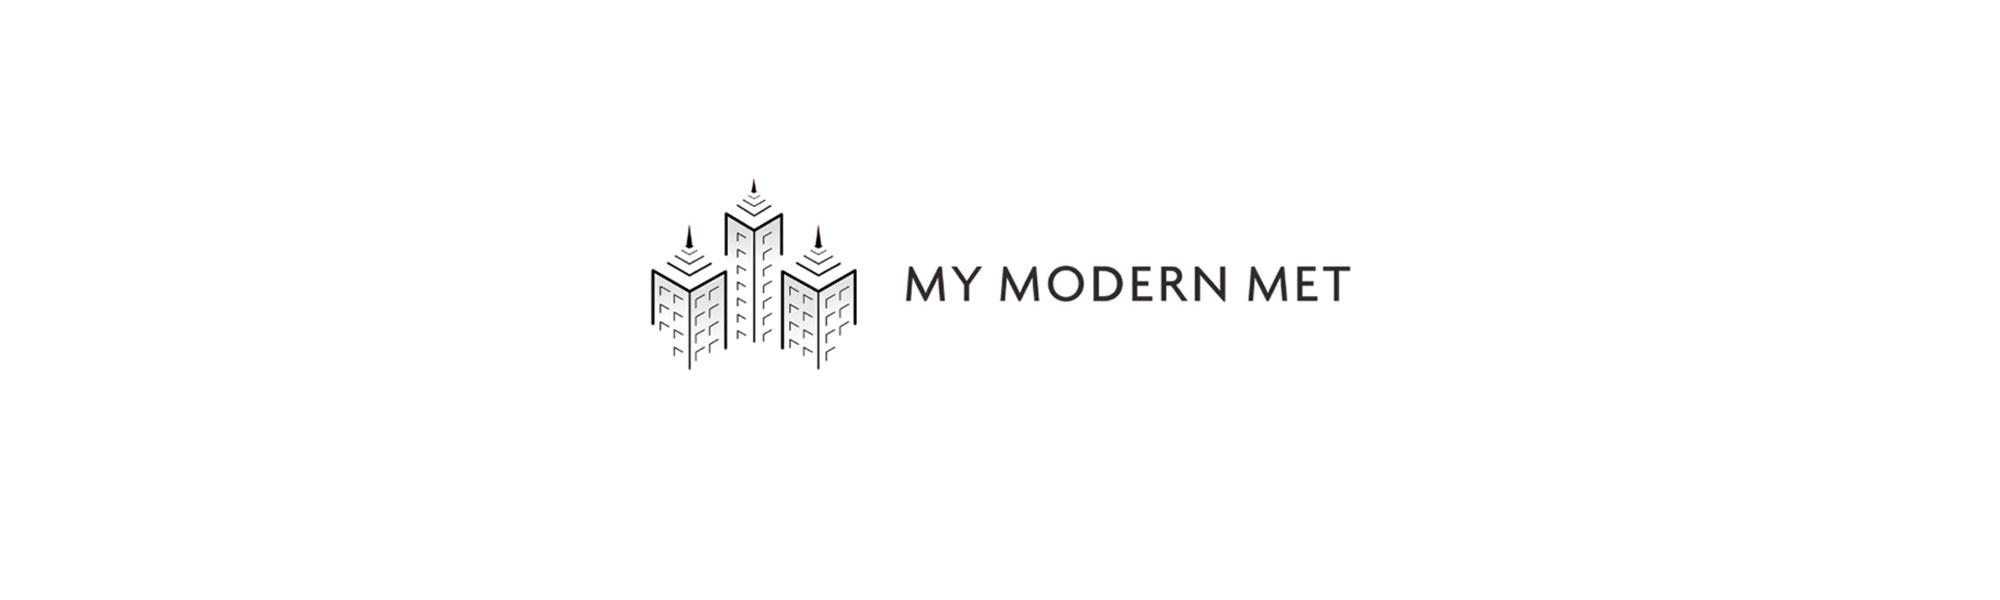 My Modern Metropolis: Joyful Portraits of Centenarians That are Happy at 100 …more